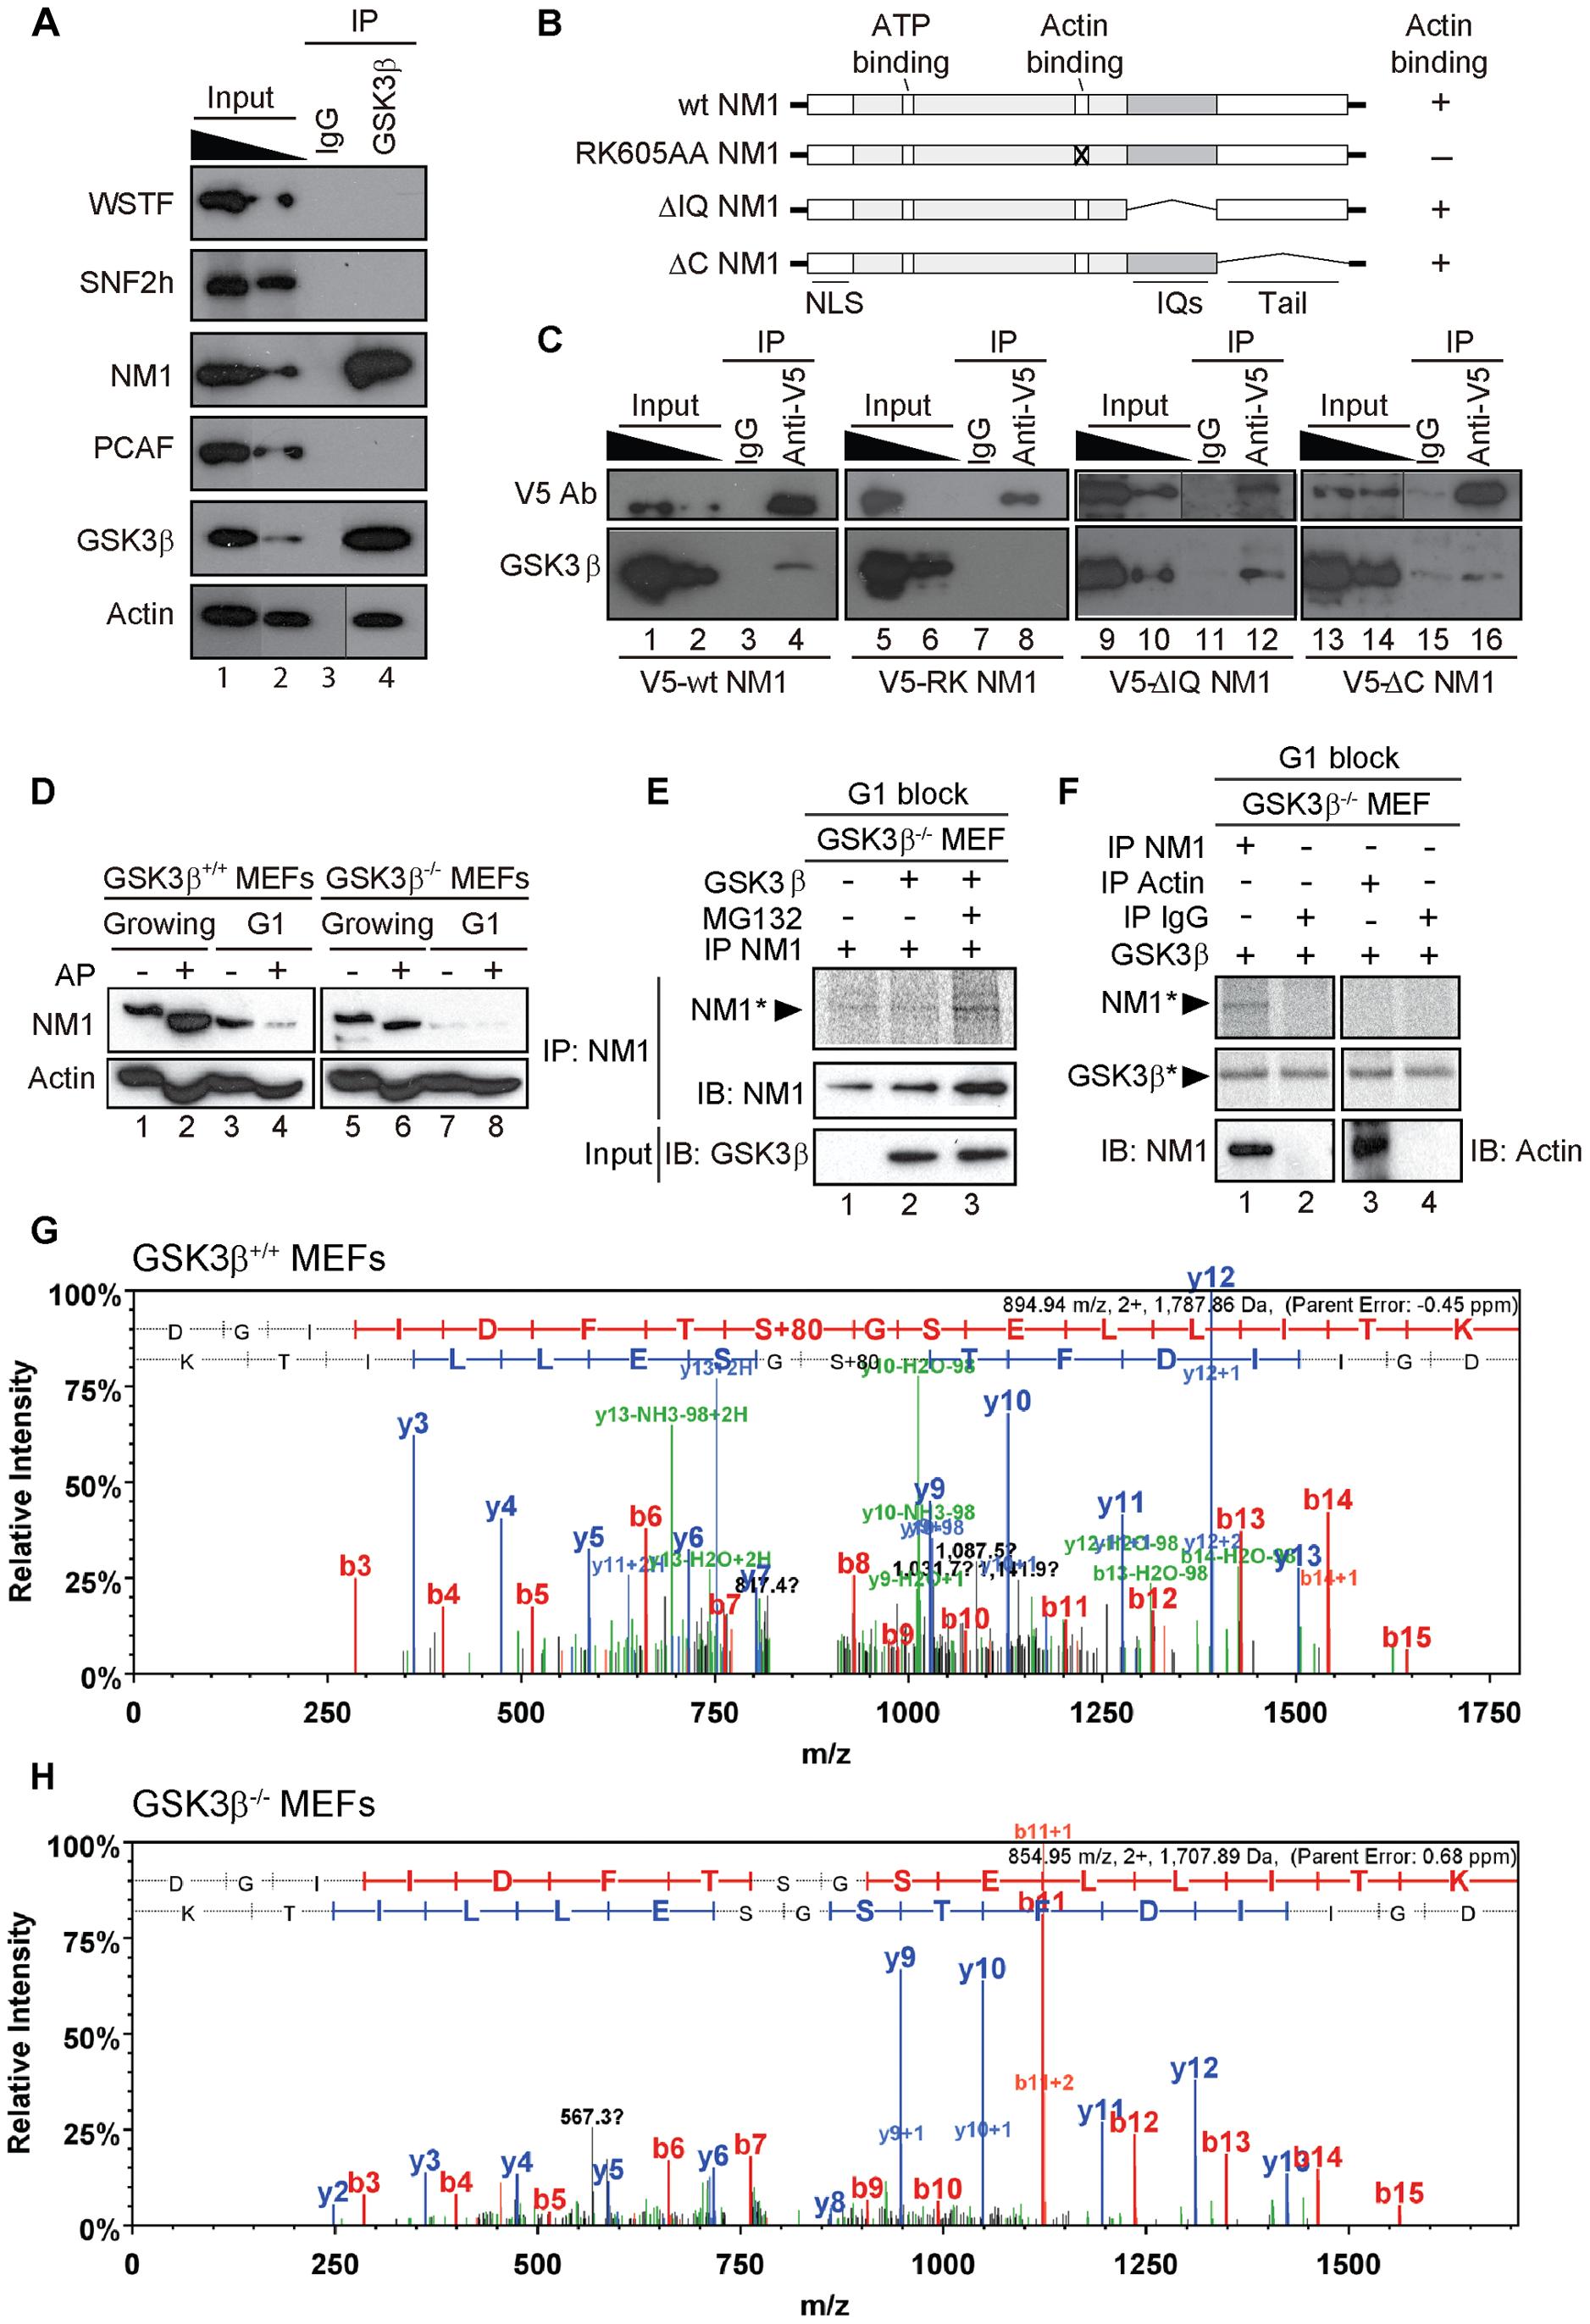 GSK3β phosphorylates NM1.